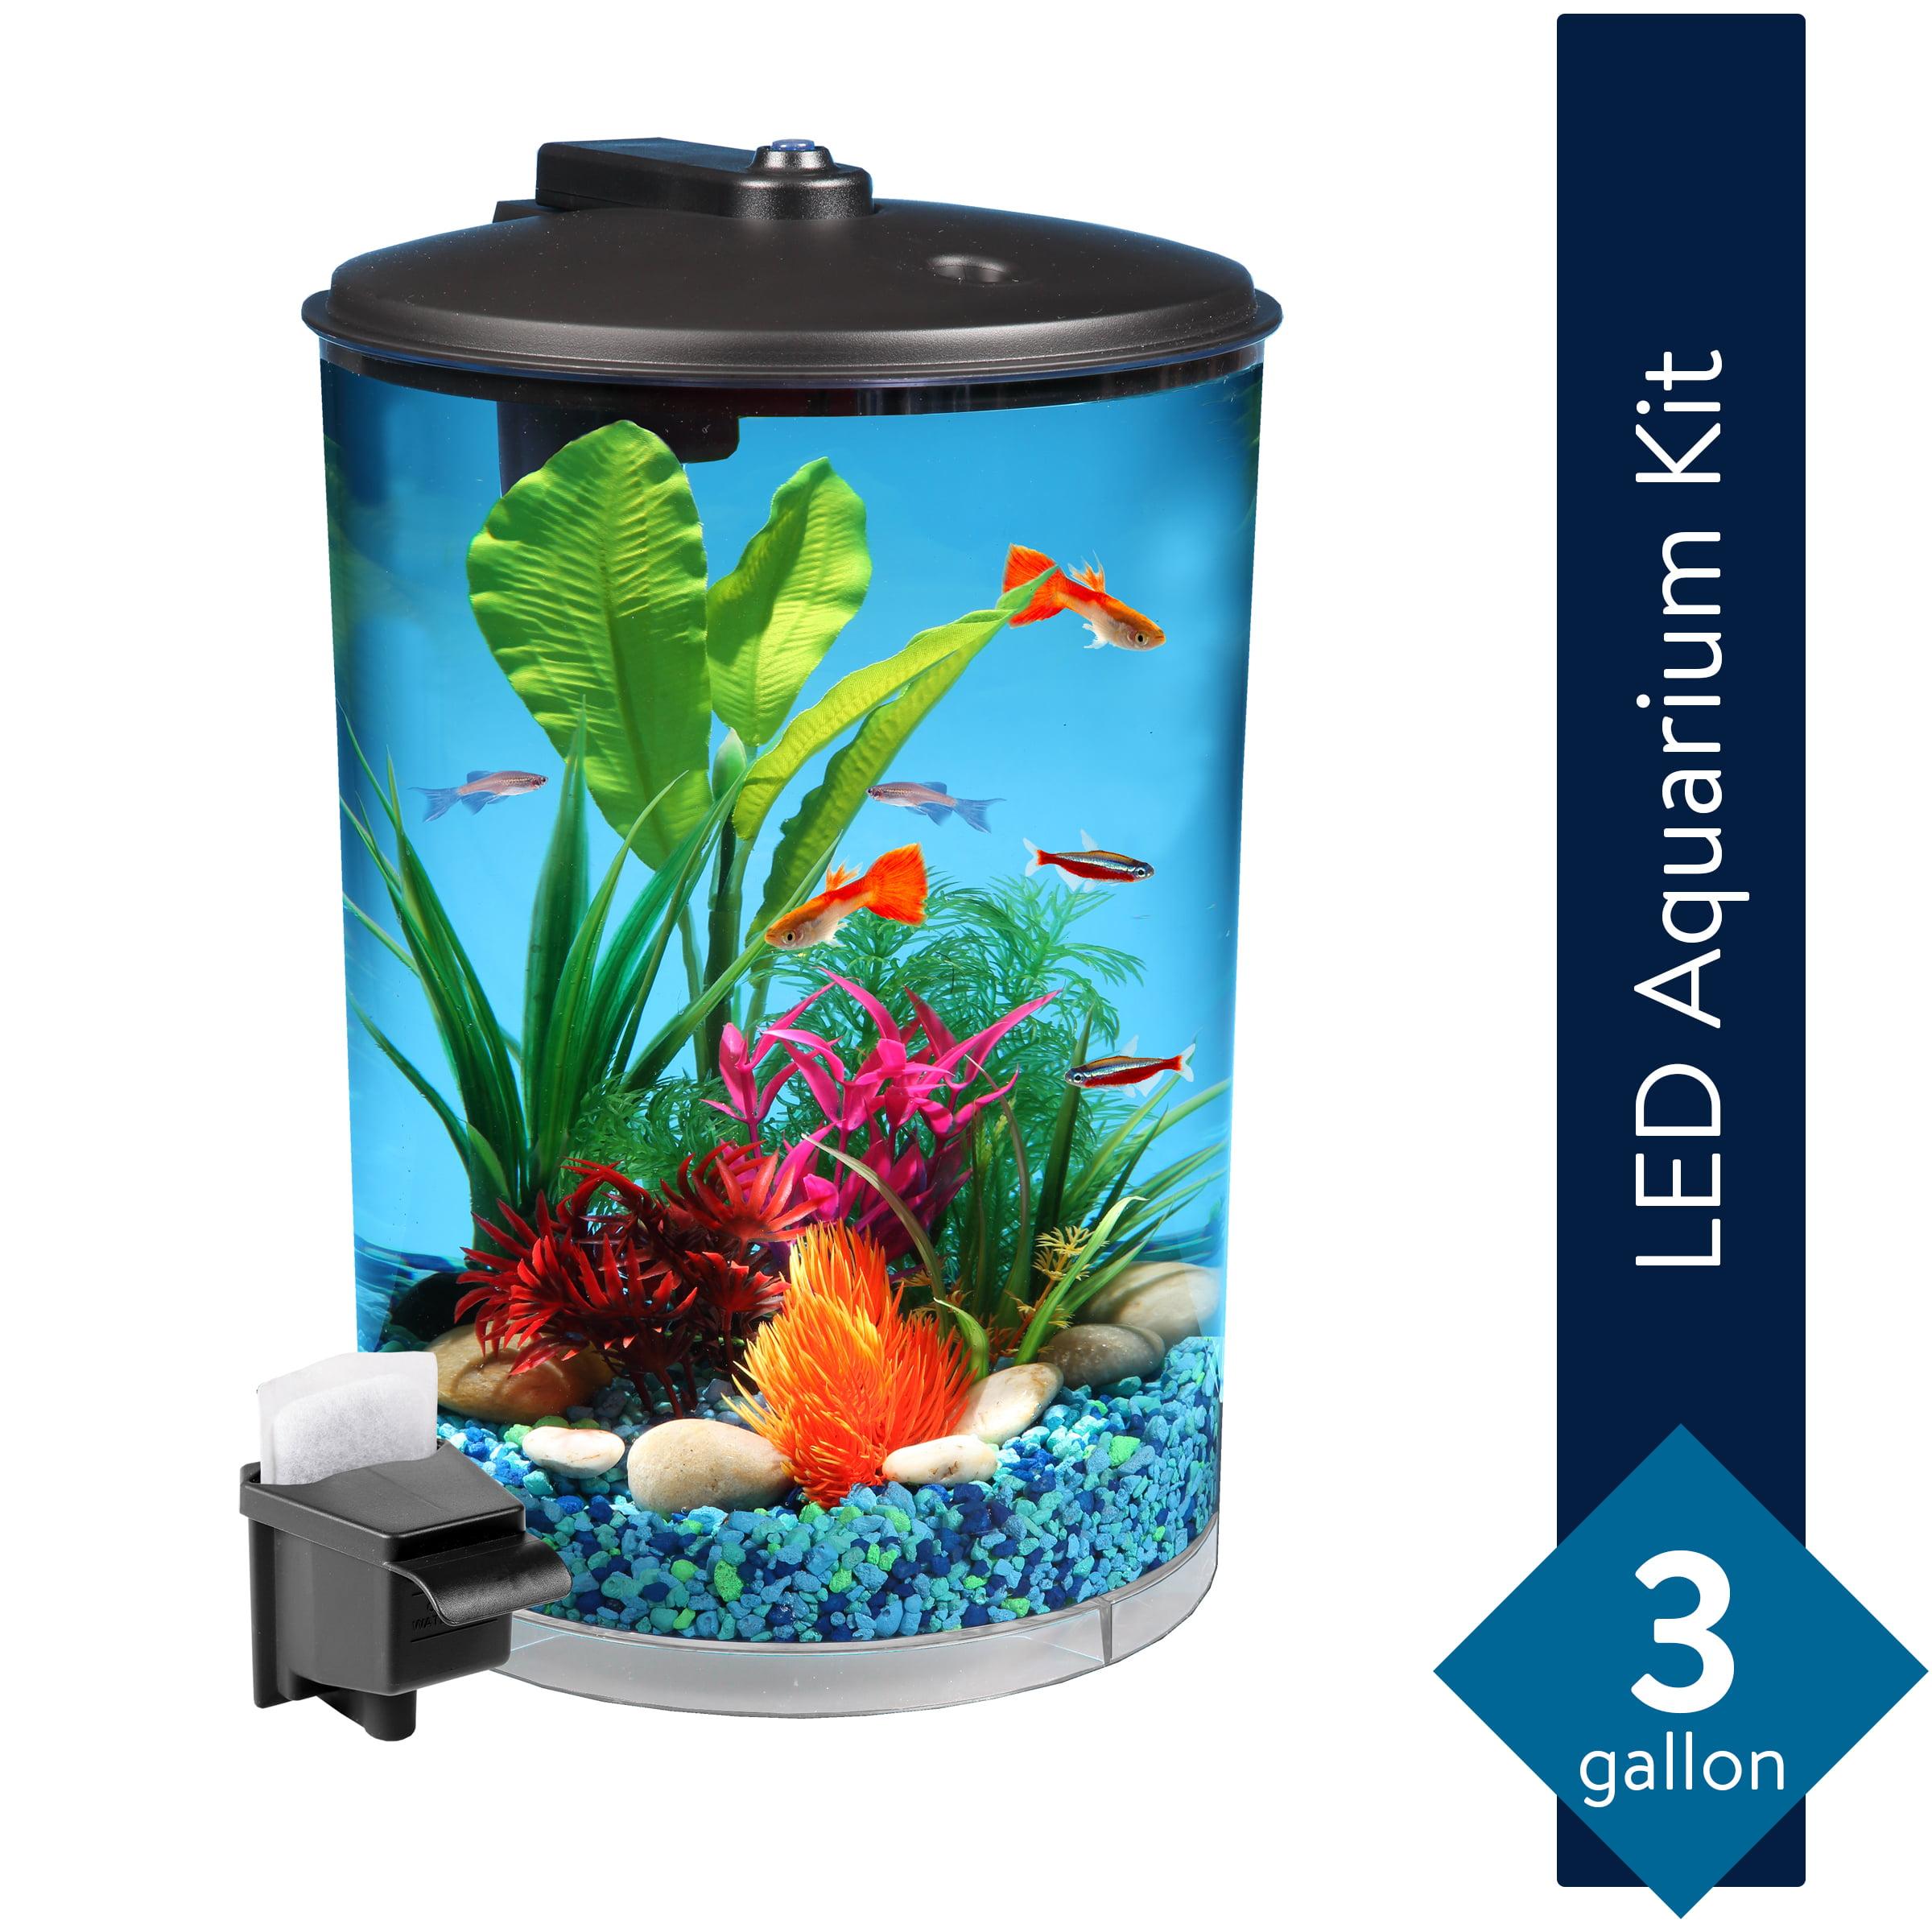 Hawkeye 3 Gallon 360 View Aquarium Kit With Led Lighting And